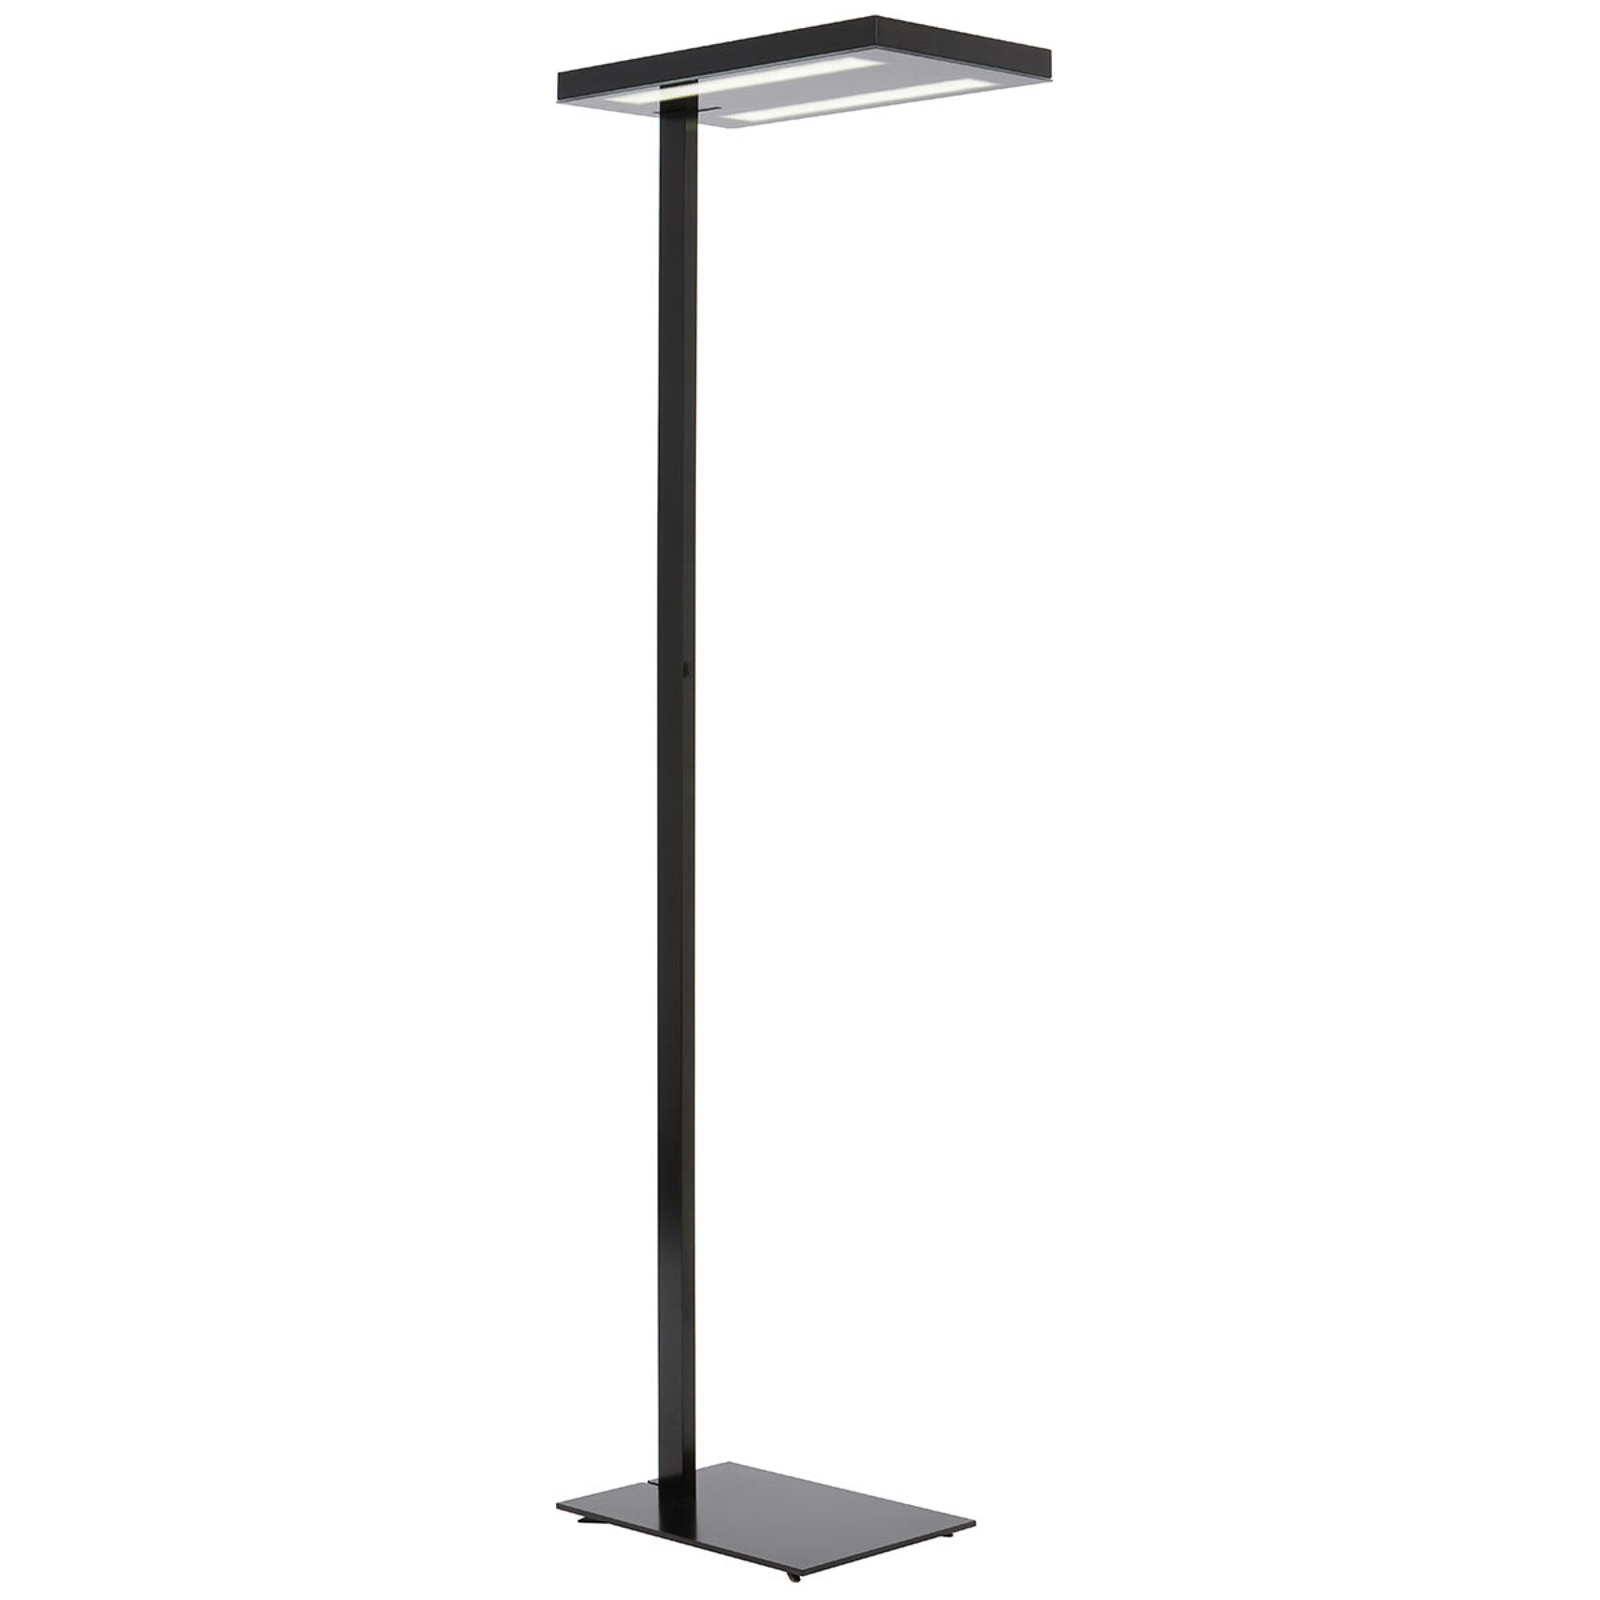 Lampa stojąca do biura Free-Floor czarna